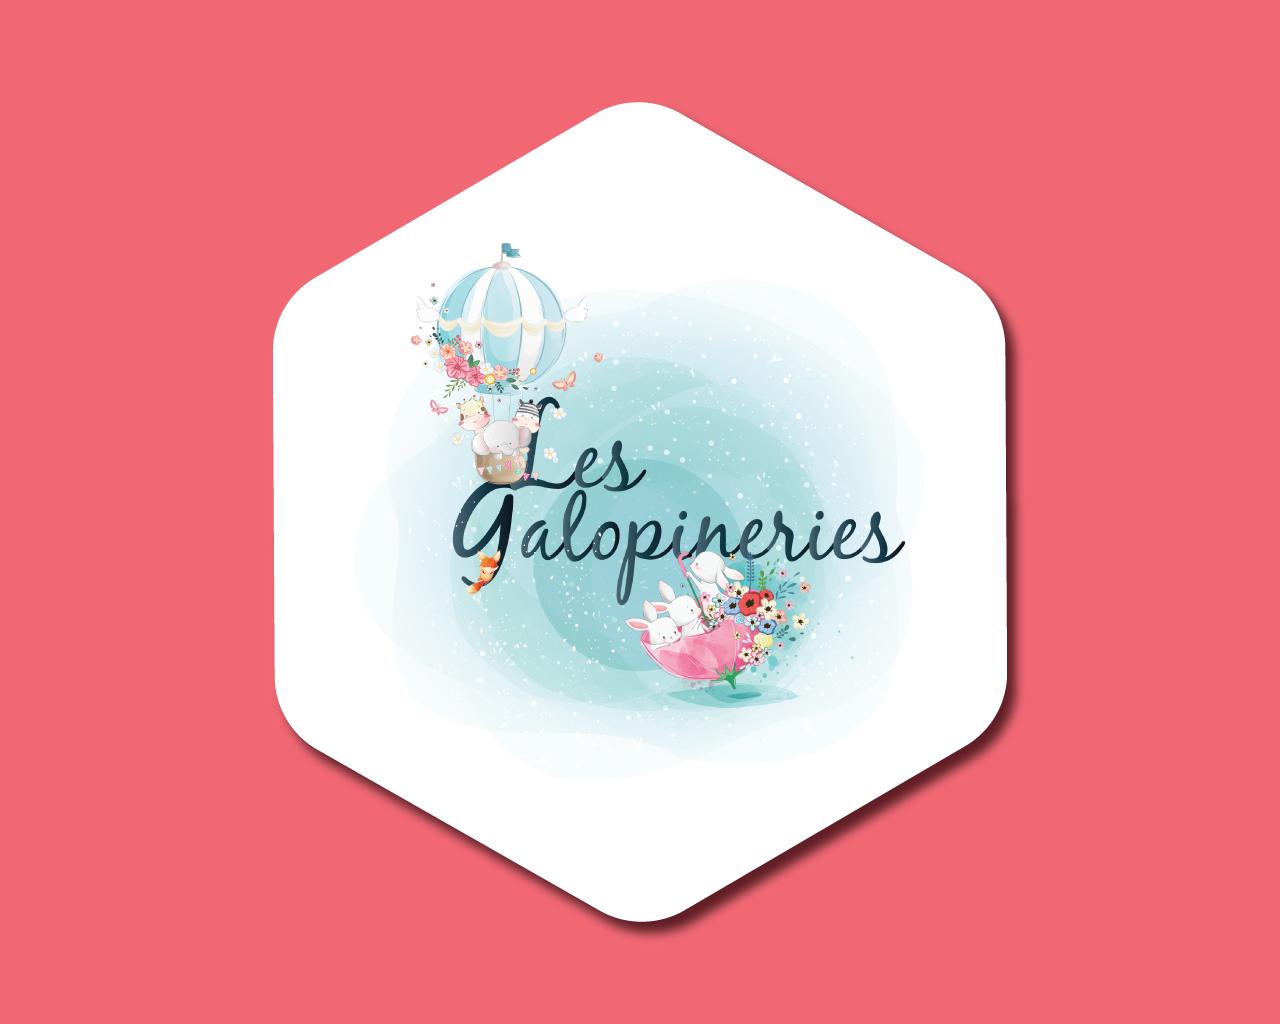 les-galopineries-logo-1